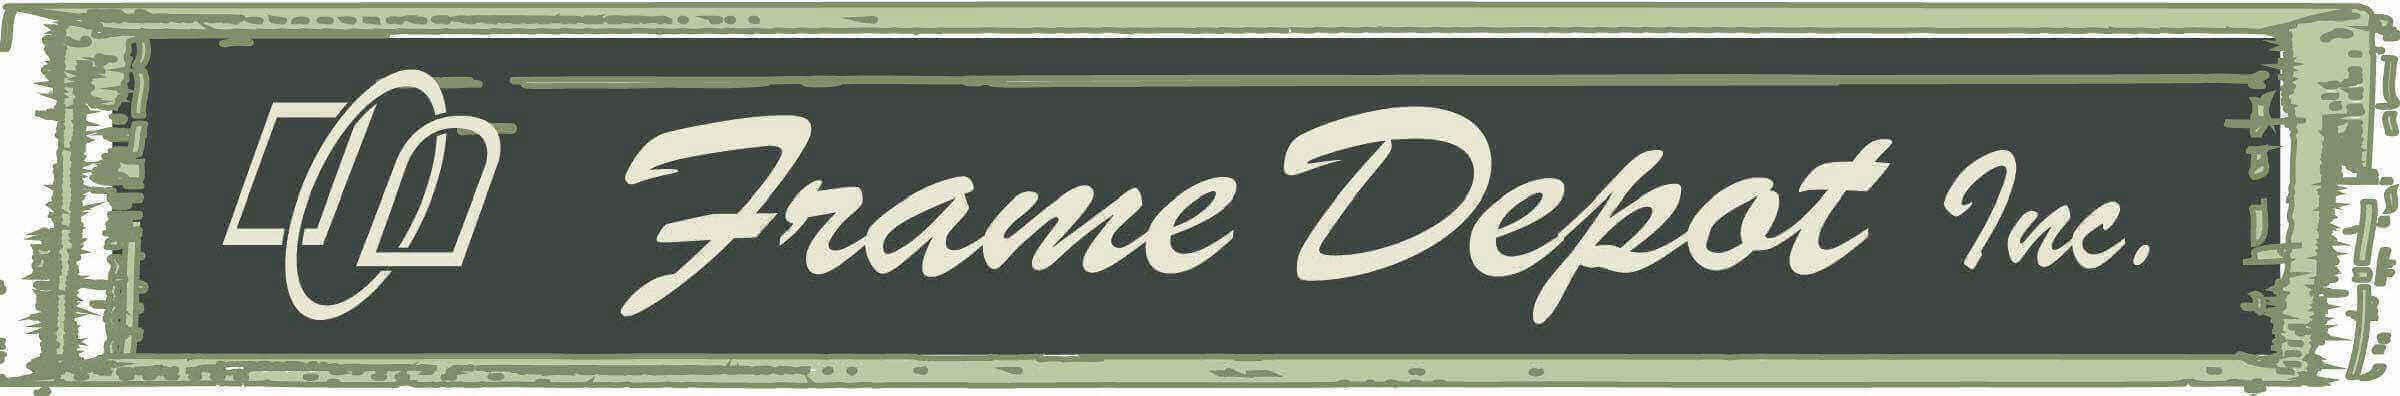 Frame Depot logo